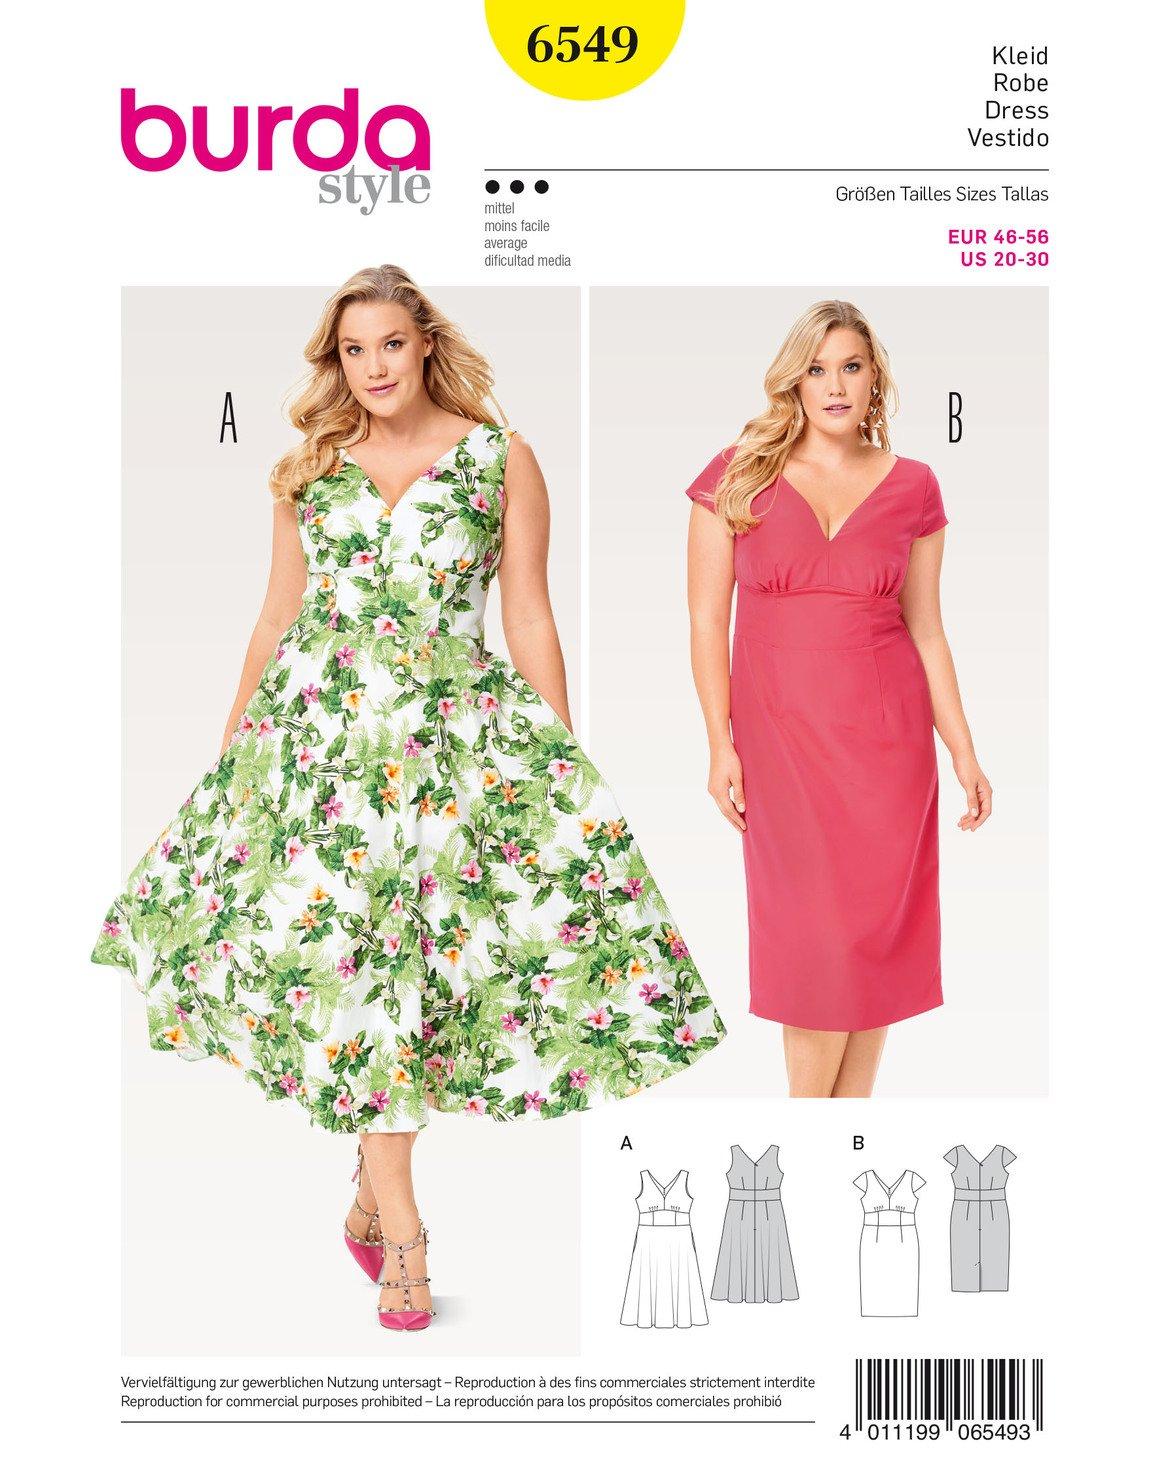 Burda 6549 Schnittmuster Kleid (Damen, Gr. 46-56) Level 3 Mittel ...